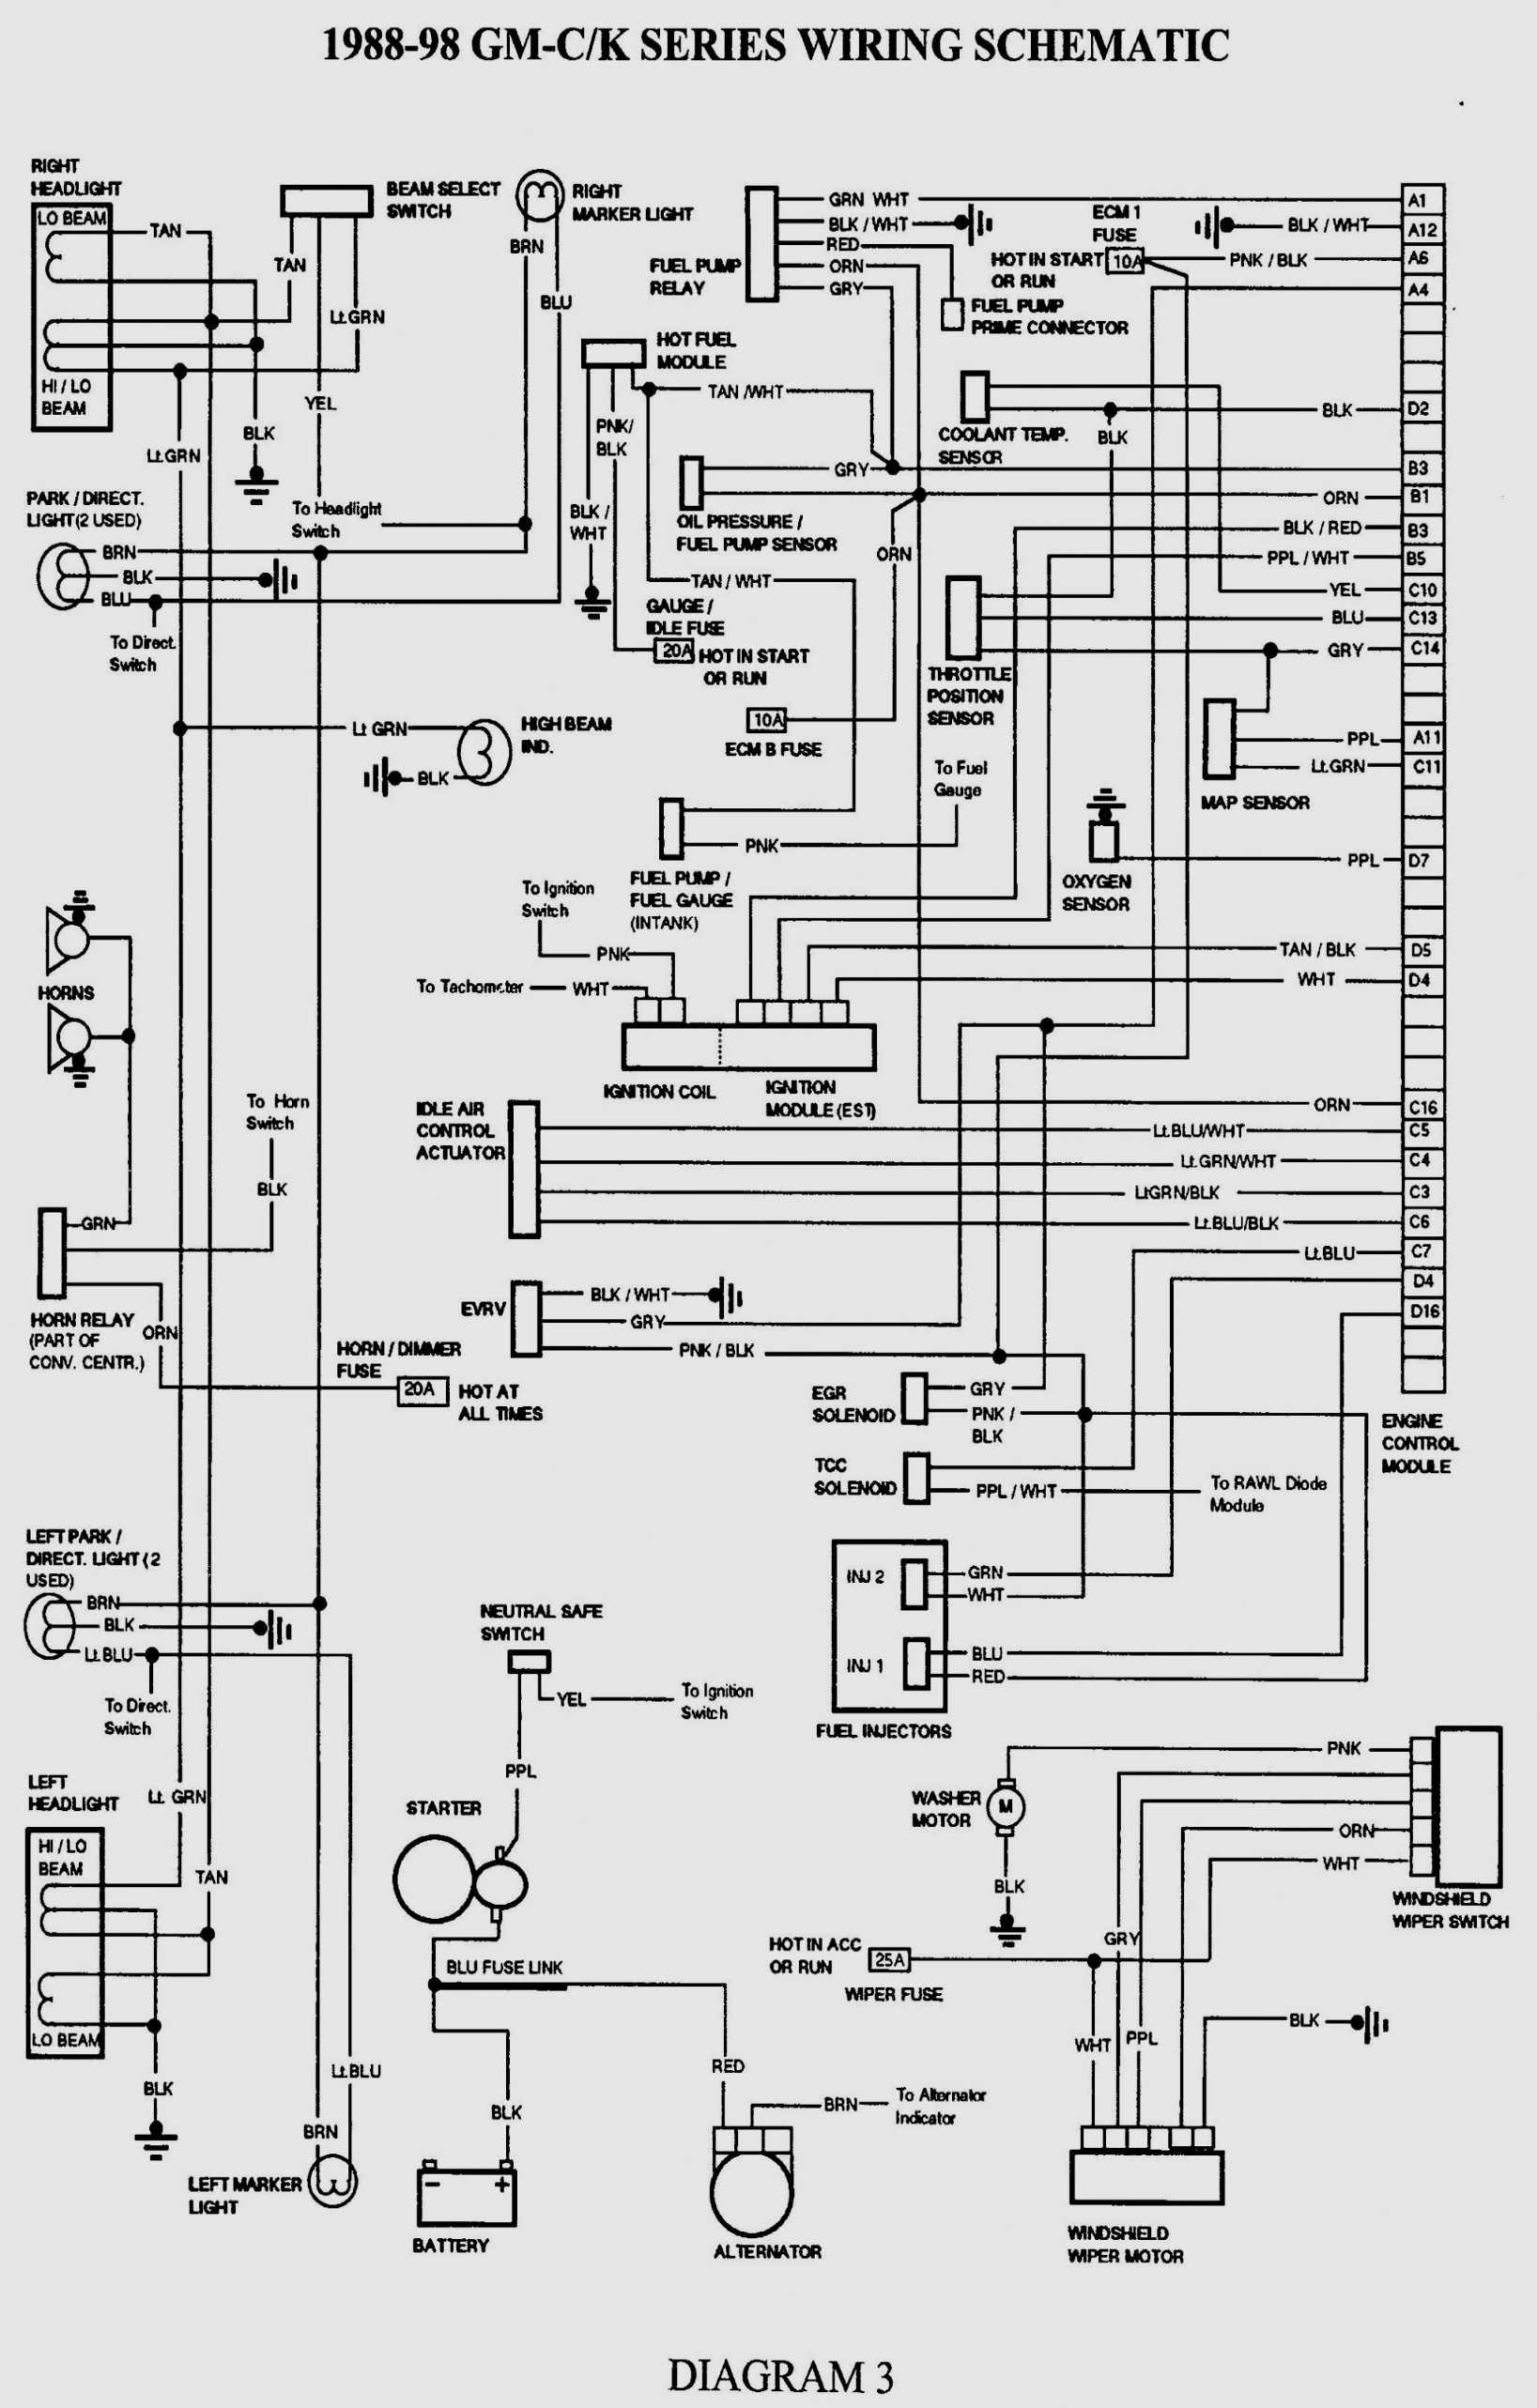 SB_4972] Fleetwood Mallard Trailer Wiring Diagram Download DiagramAtota Heeve Trons Mohammedshrine Librar Wiring 101